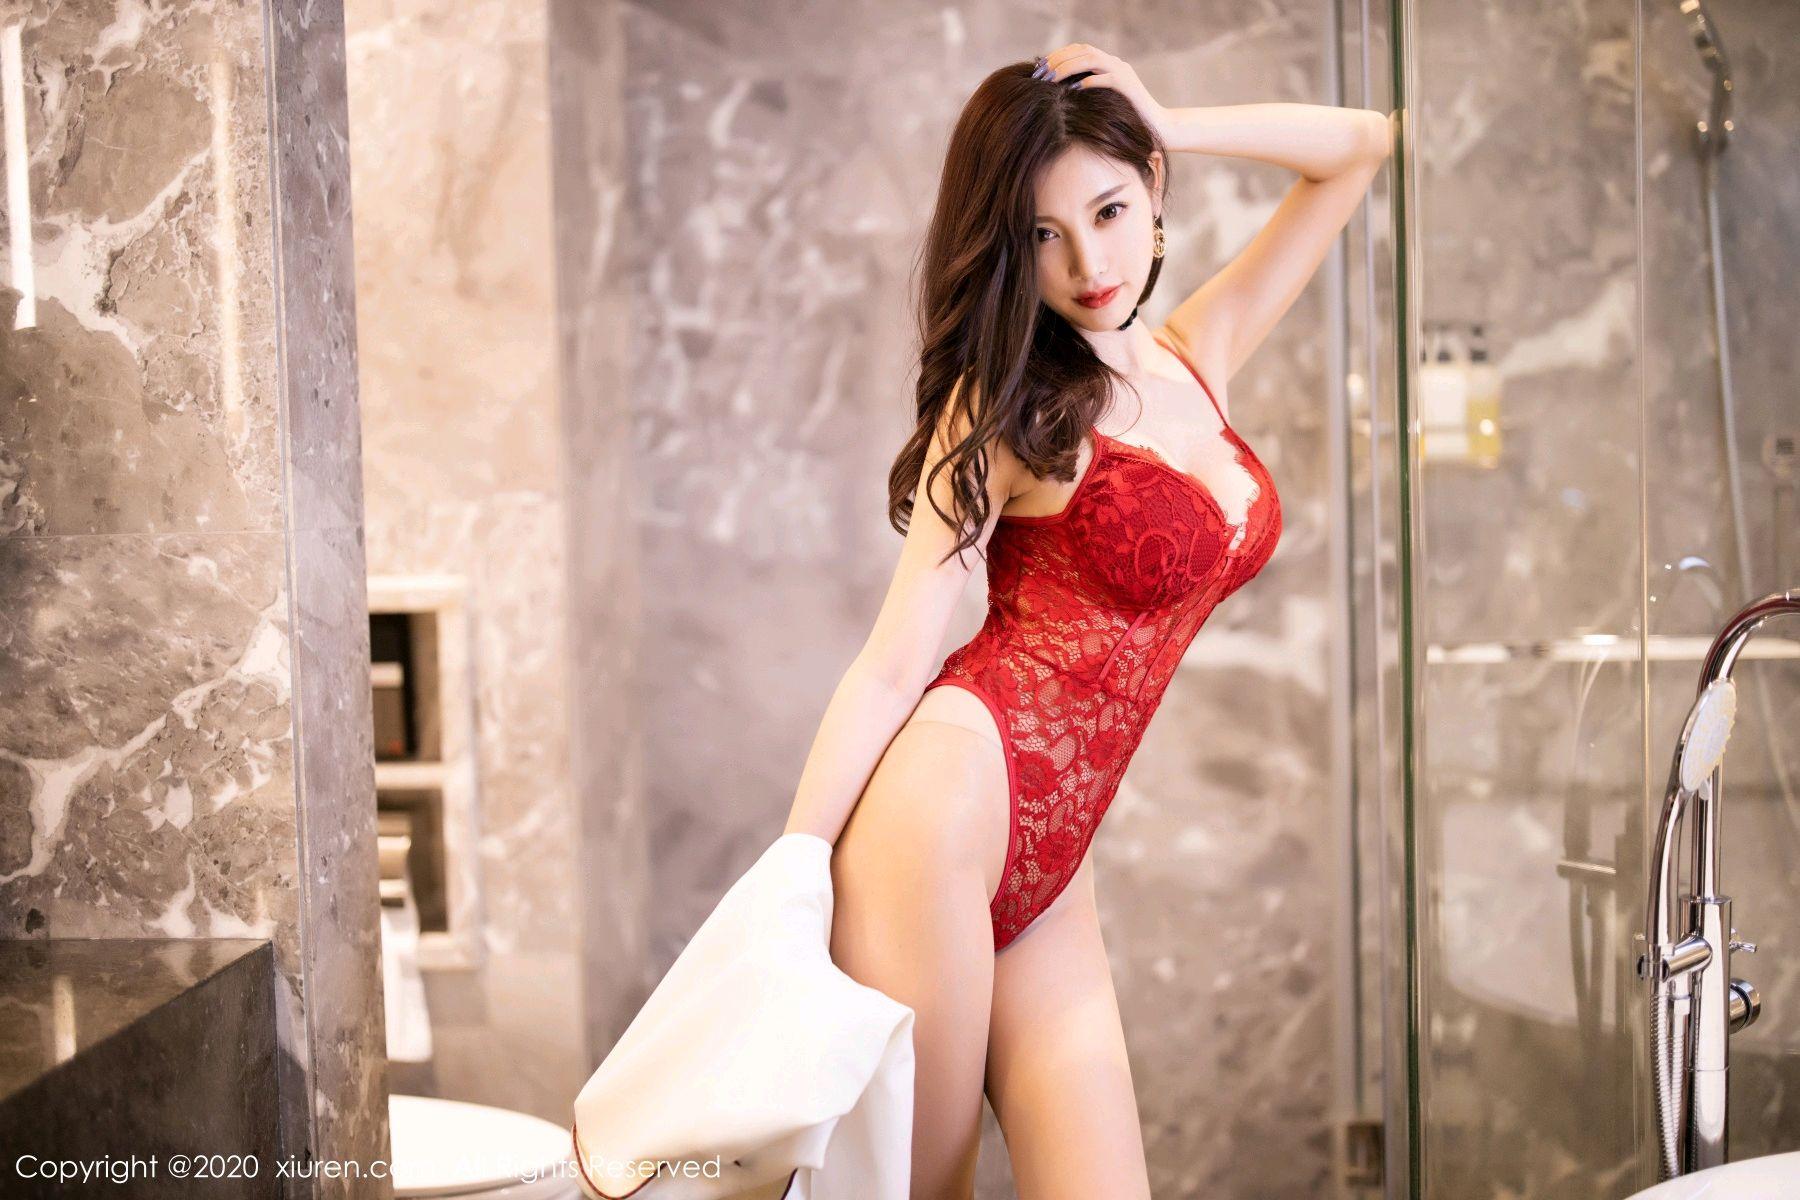 [XiuRen] Vol.2671 Yang Chen Chen 29P, Underwear, Xiuren, Yang Chen Chen